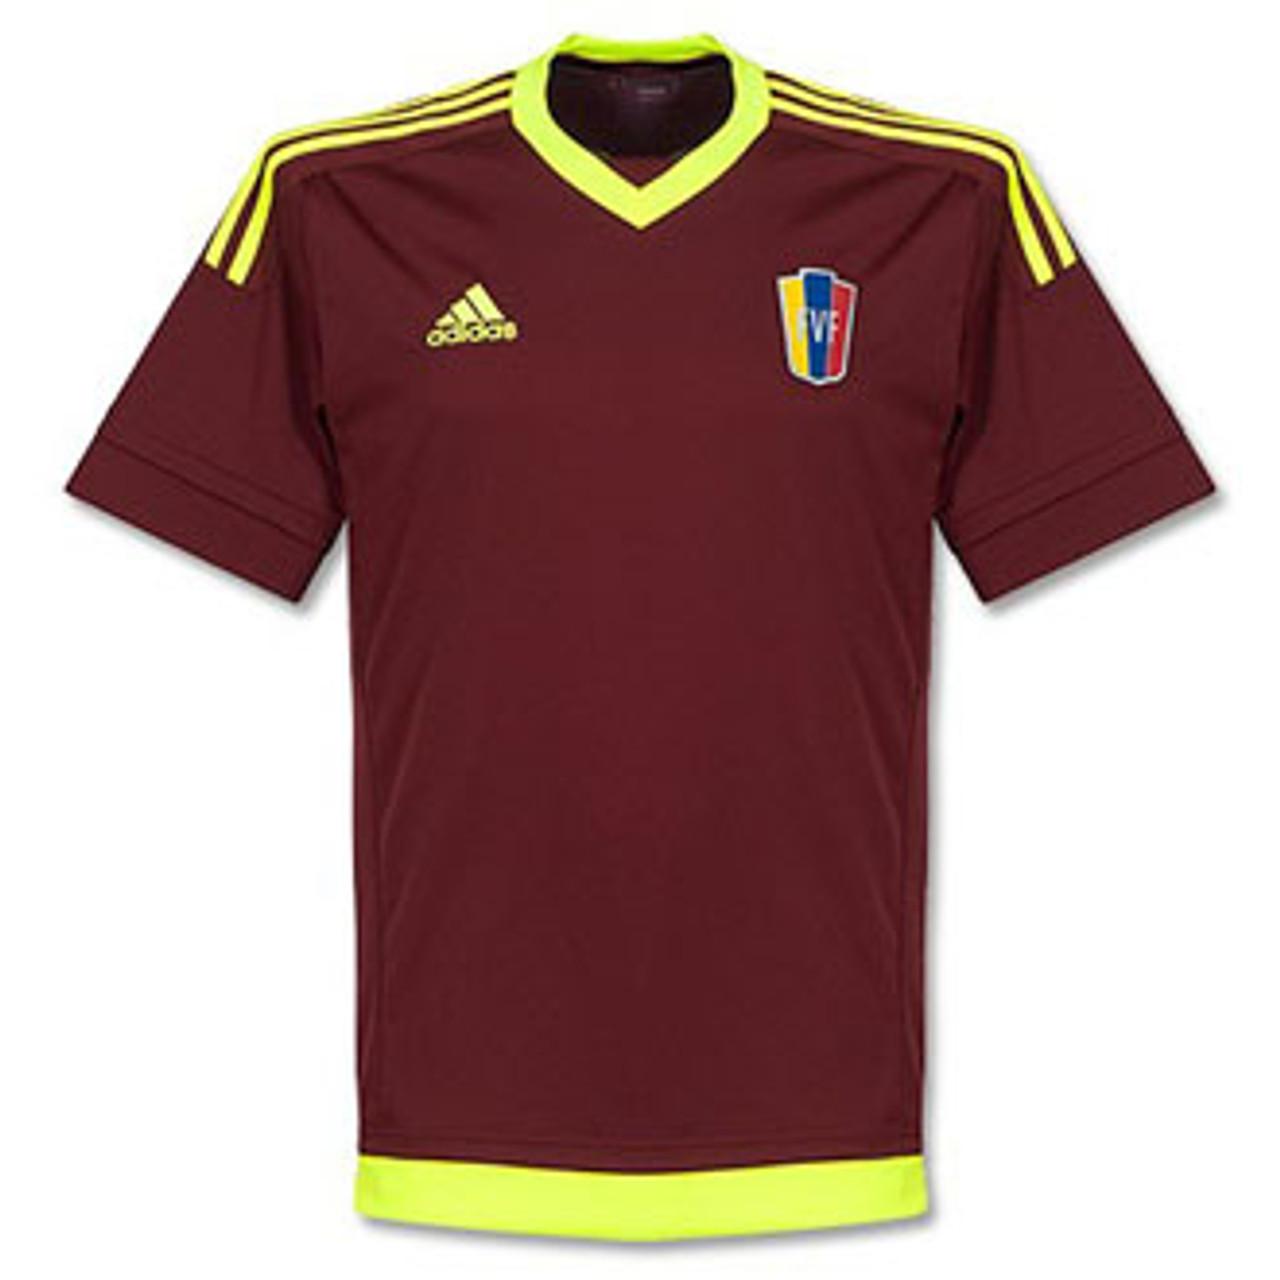 adidas shirt 16